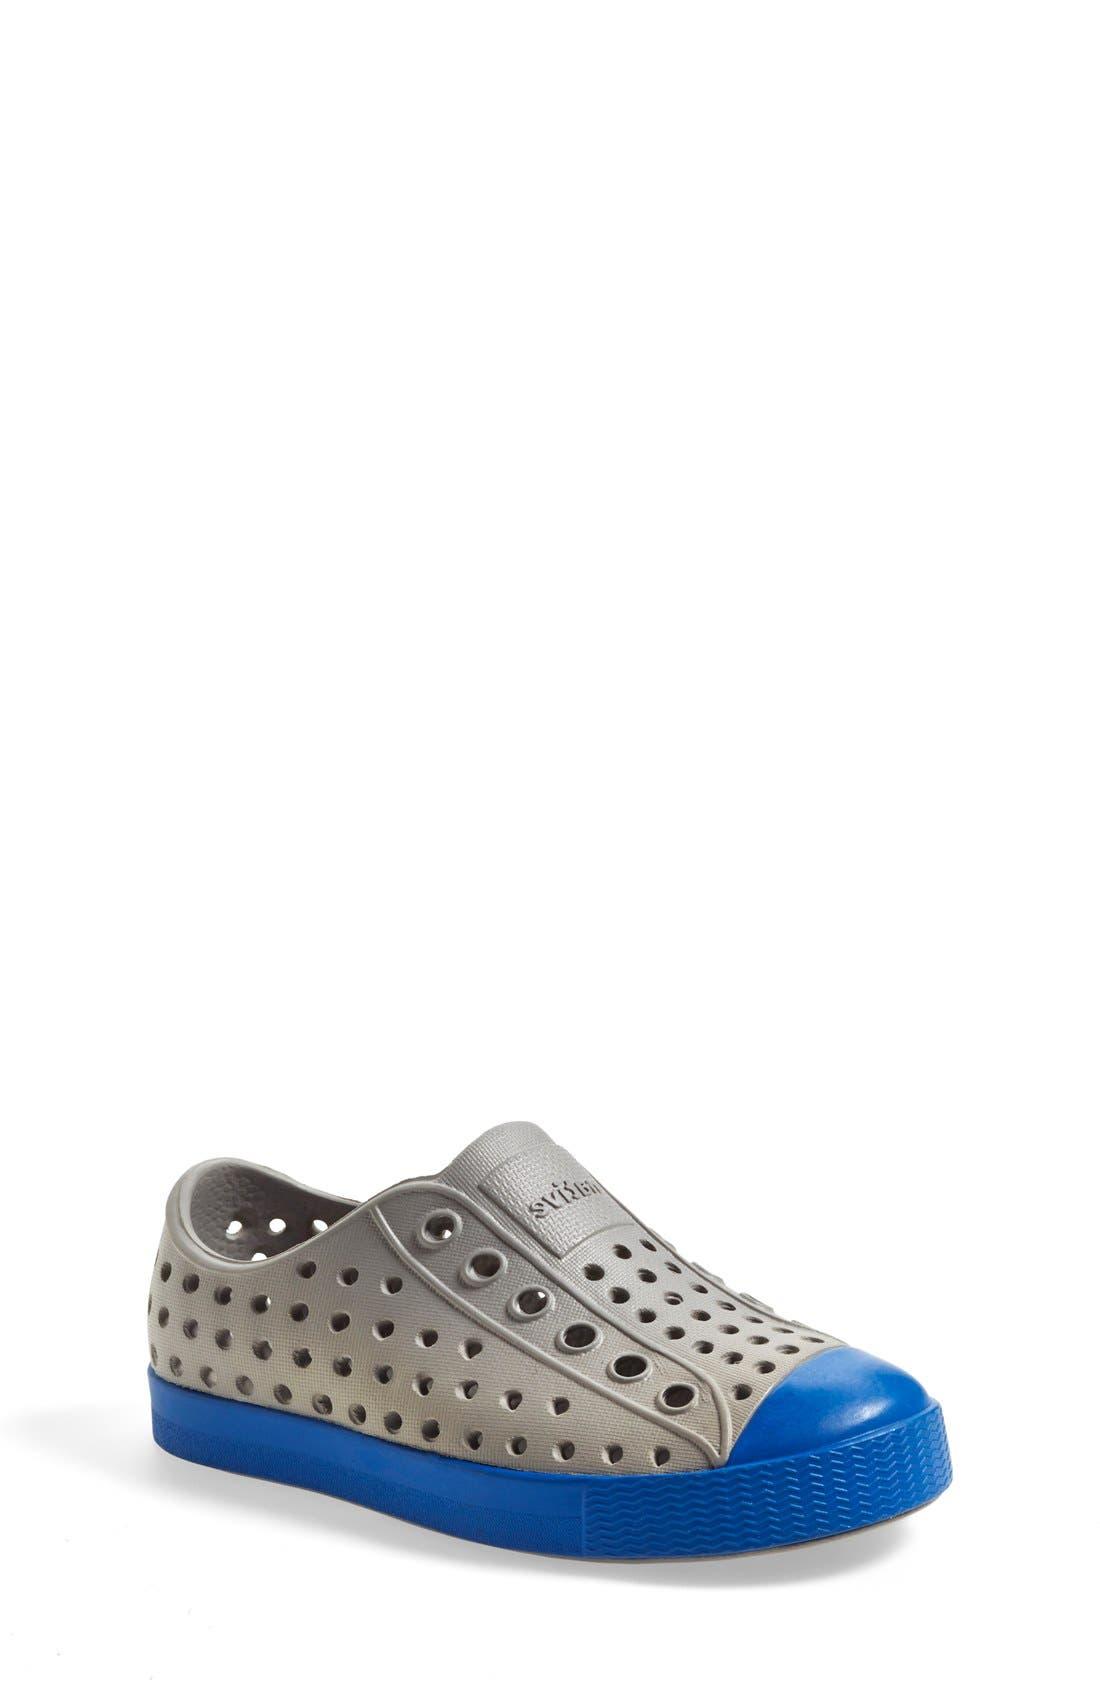 'Jefferson' Water Friendly Slip-On Sneaker,                             Main thumbnail 30, color,